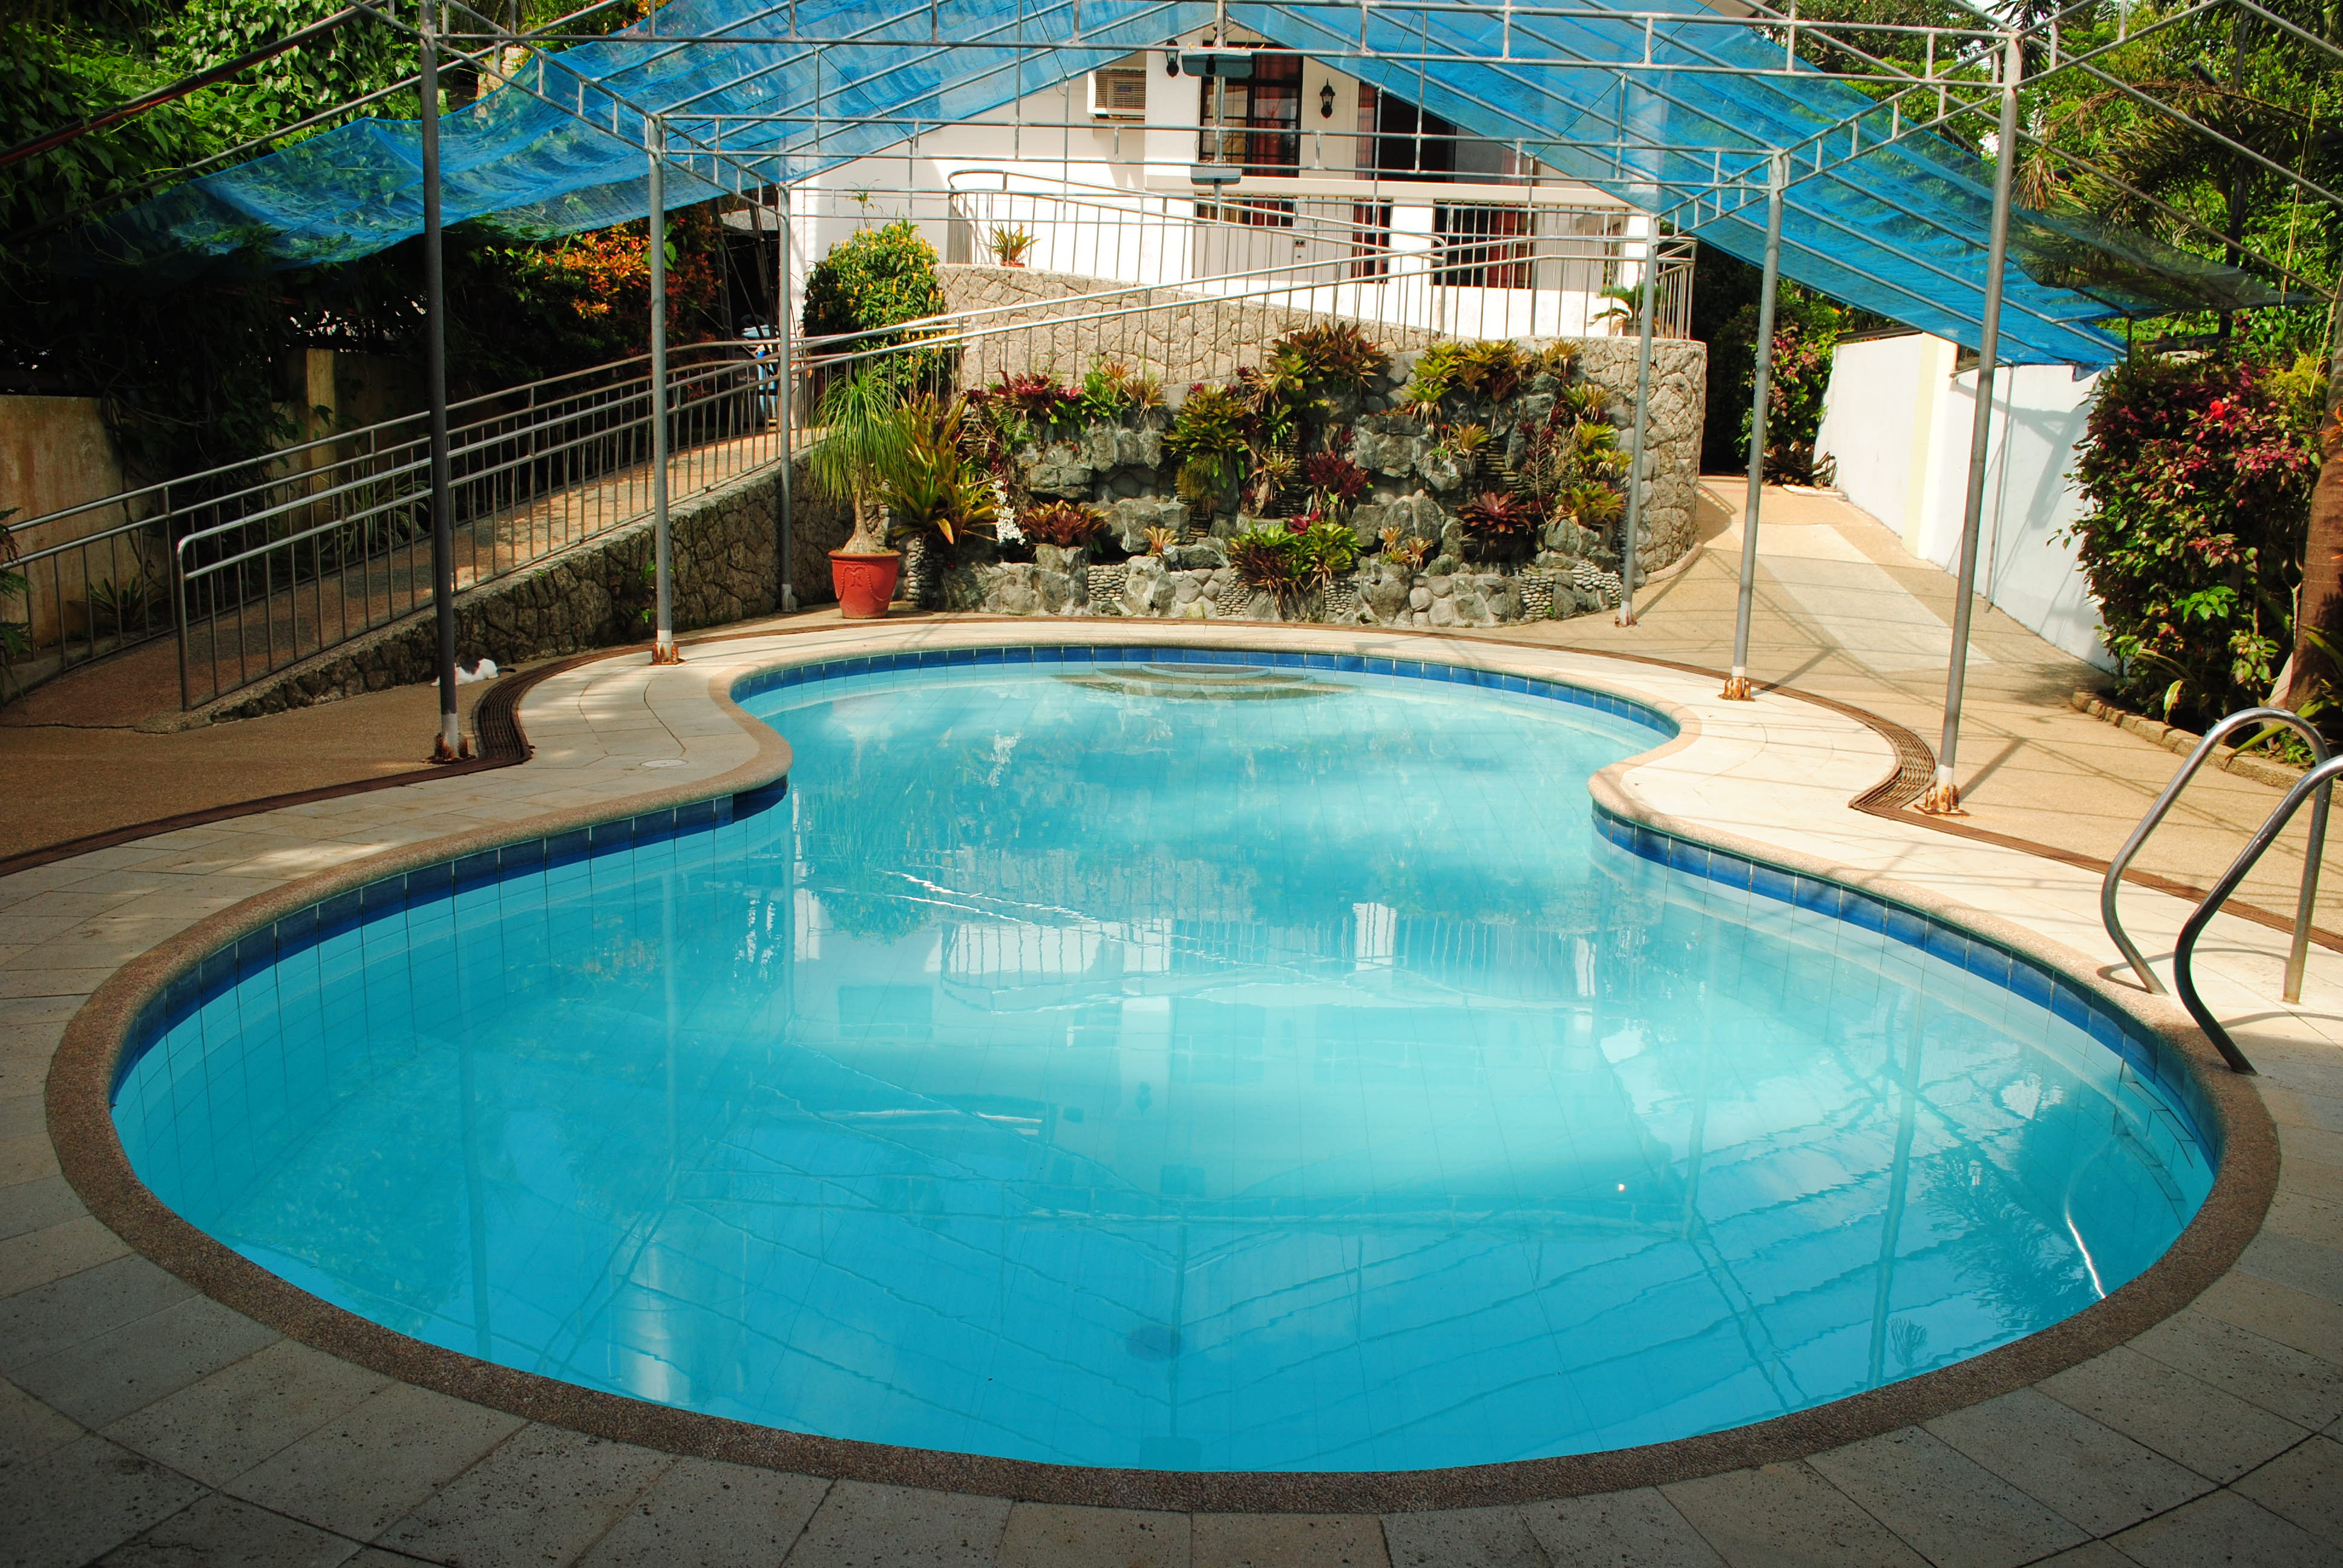 staycation 101 tagaytay city ph no juan is an island